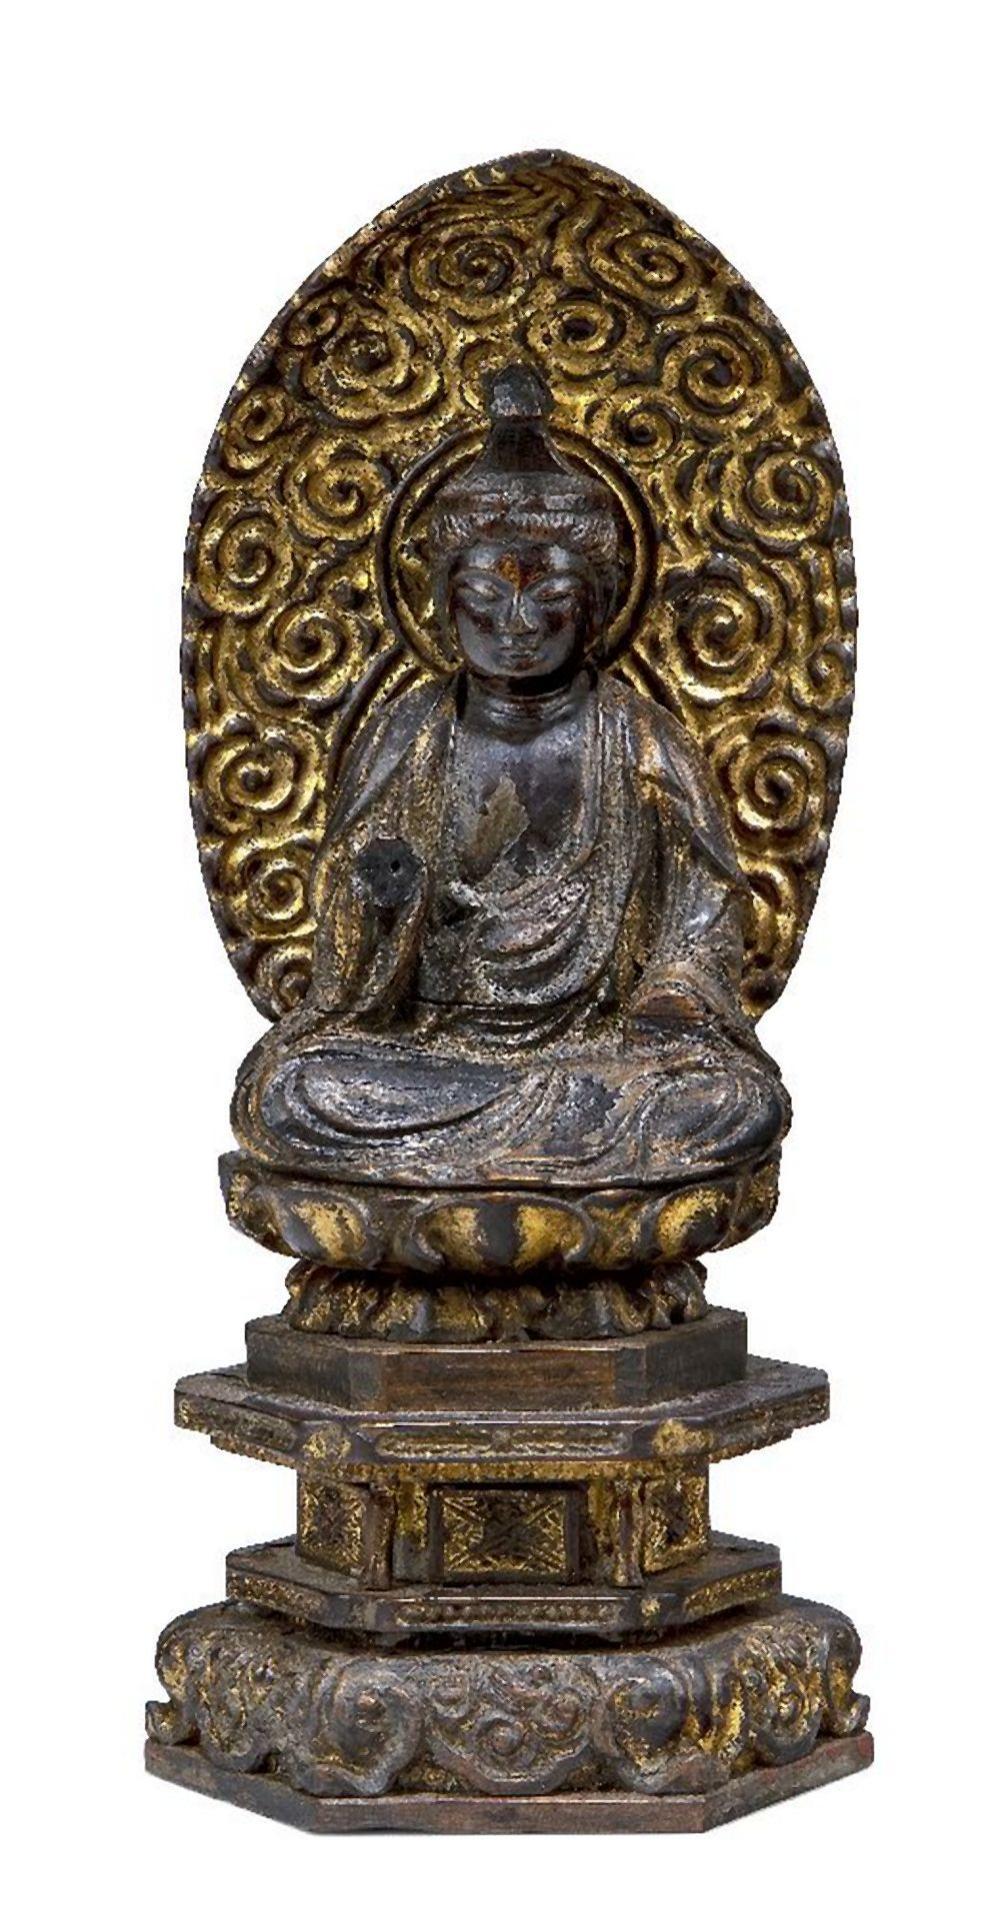 A Japanese parcel-gilt carving of Amitabha Buddha, 18th century, carved seated on a hexagonal base,